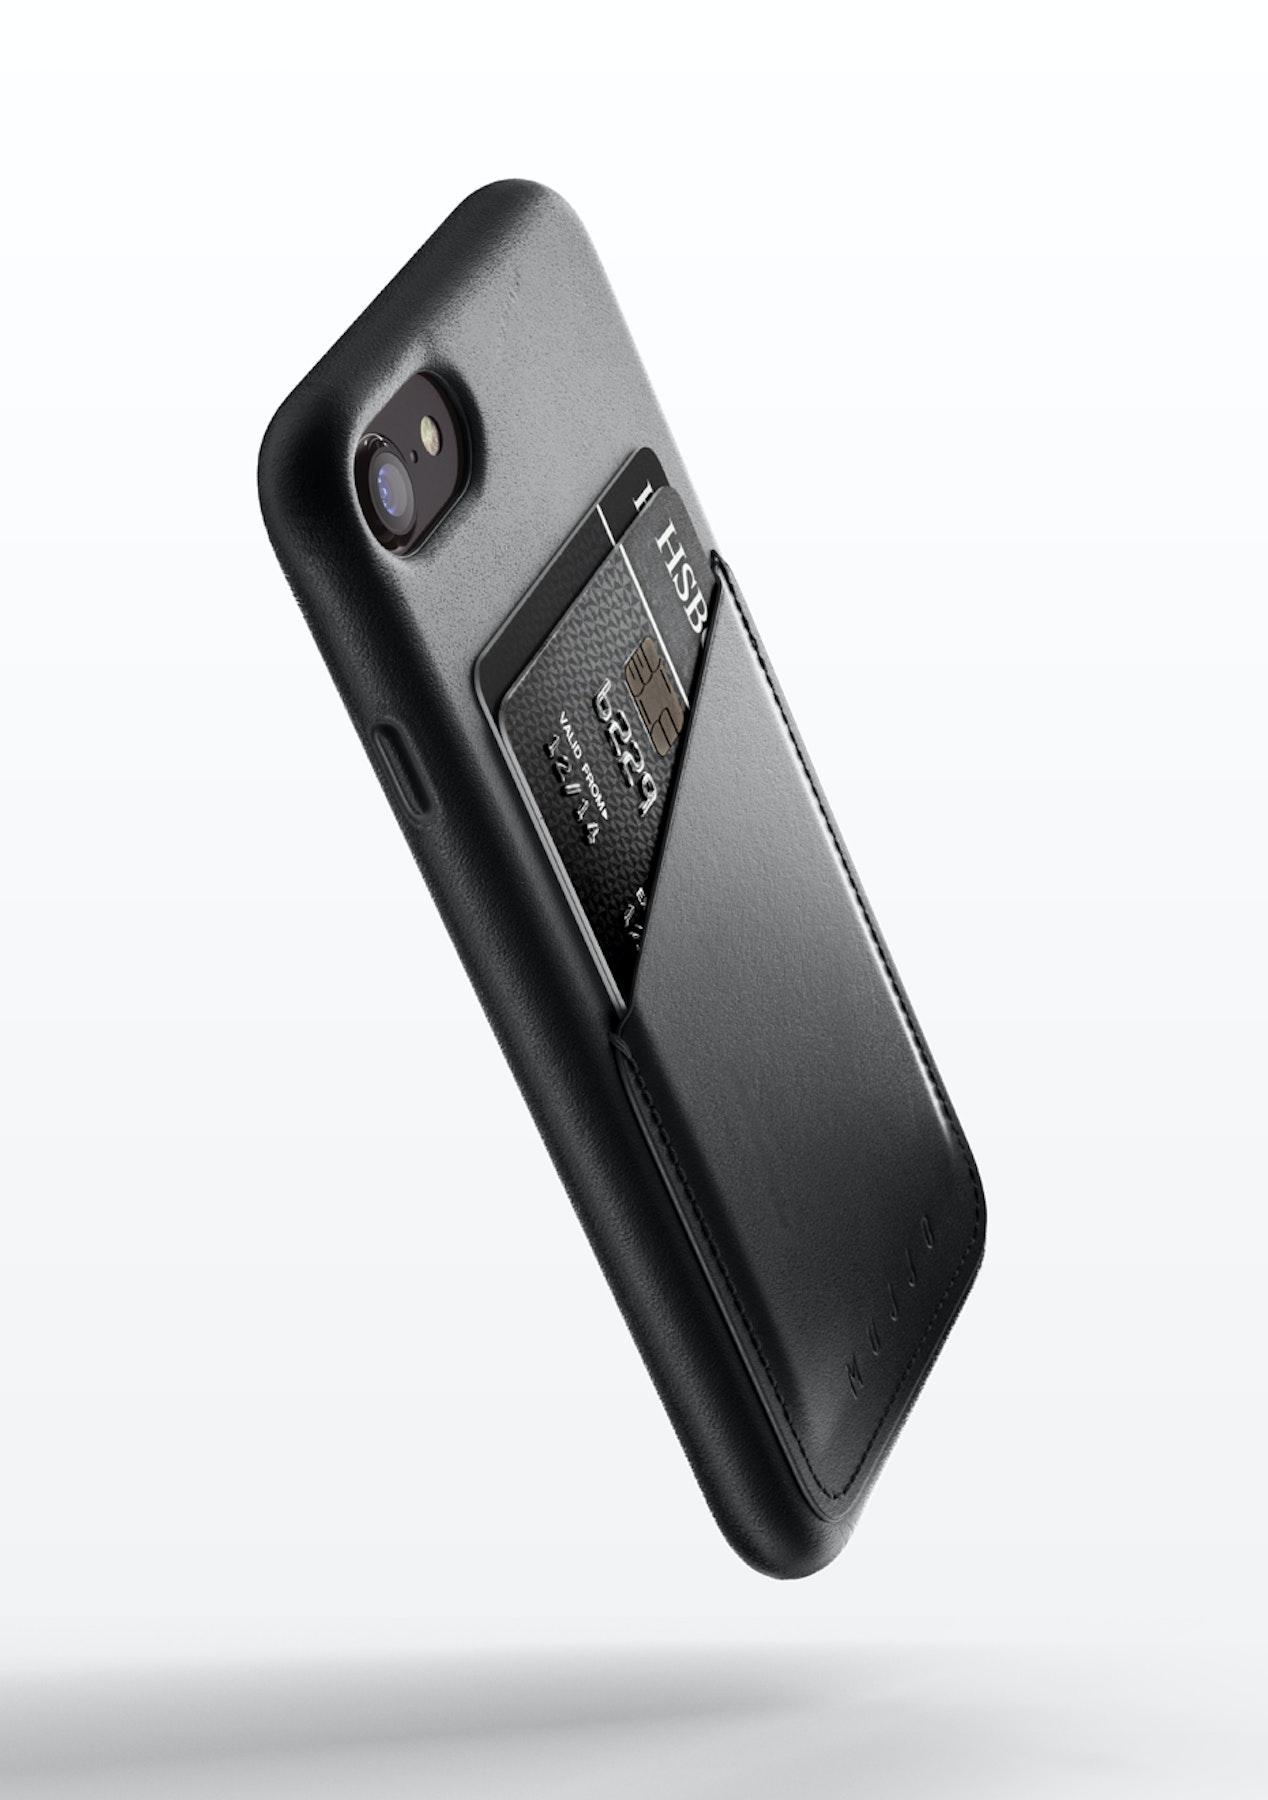 online store 9af4b 25d28 Mujjo Leather Wallet Case for iPhone 7 - Black